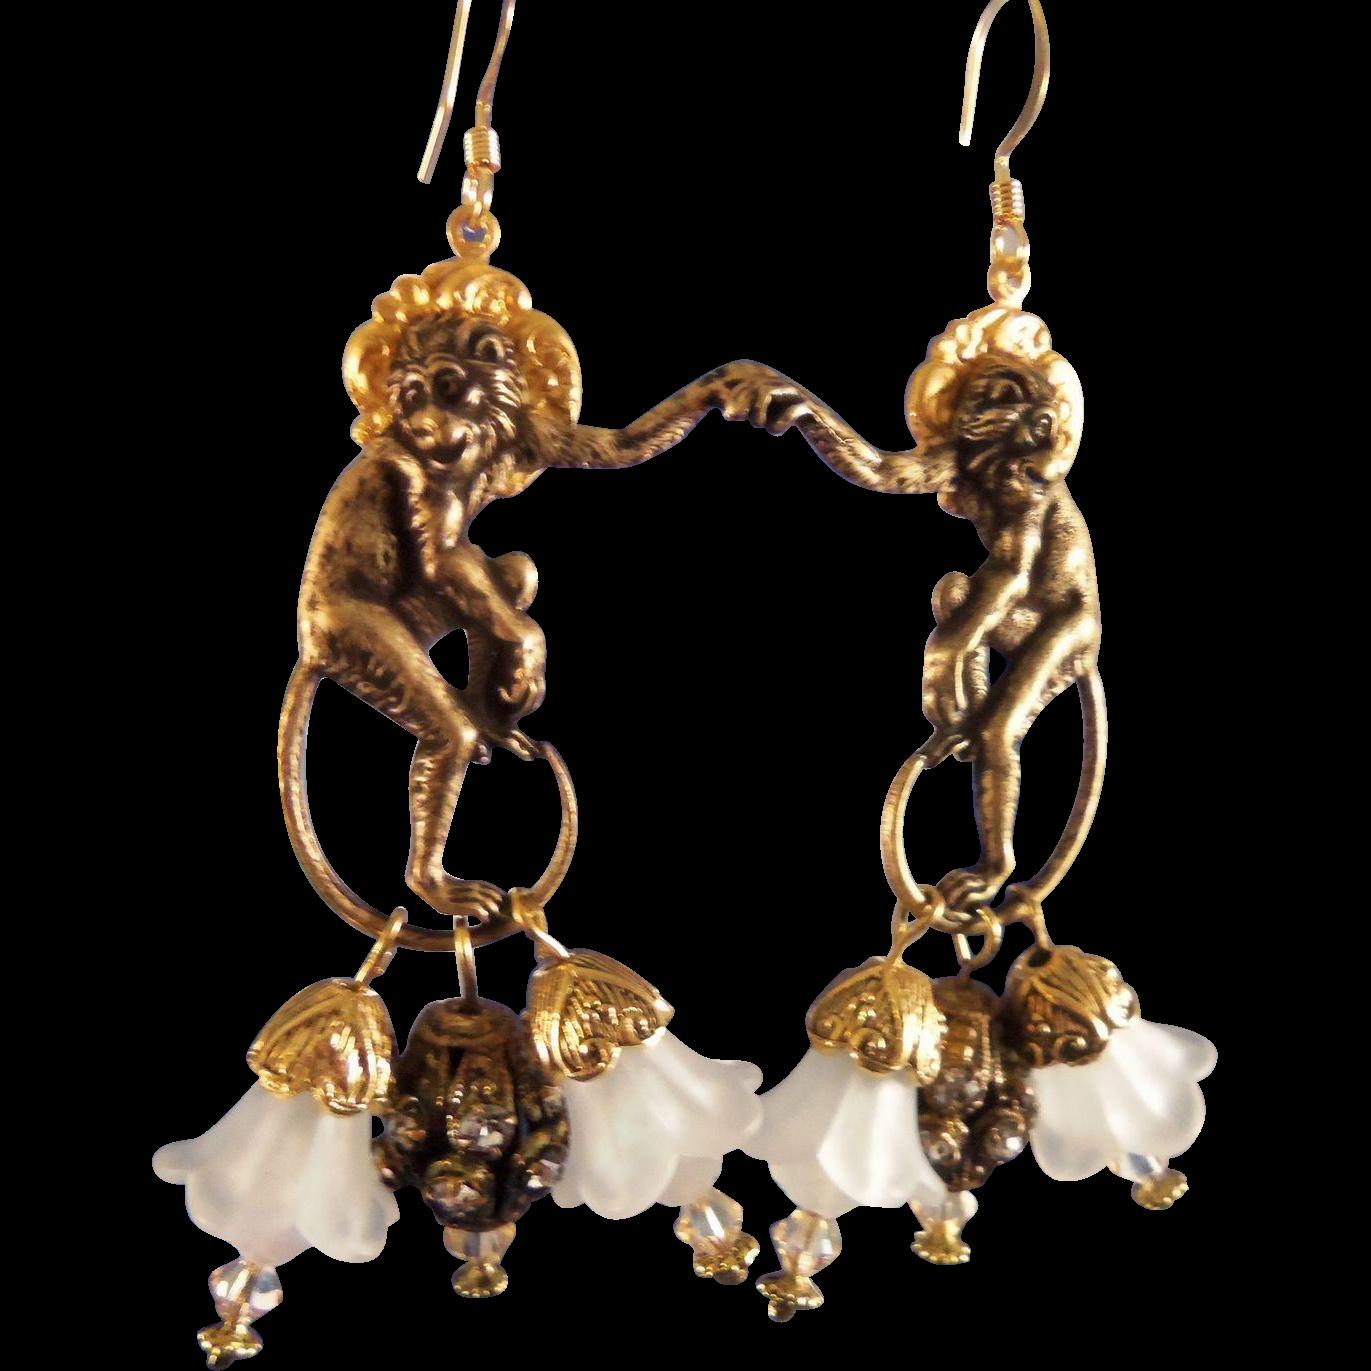 Artisan Earrings : Artisan earrings saint simeon in the garden from